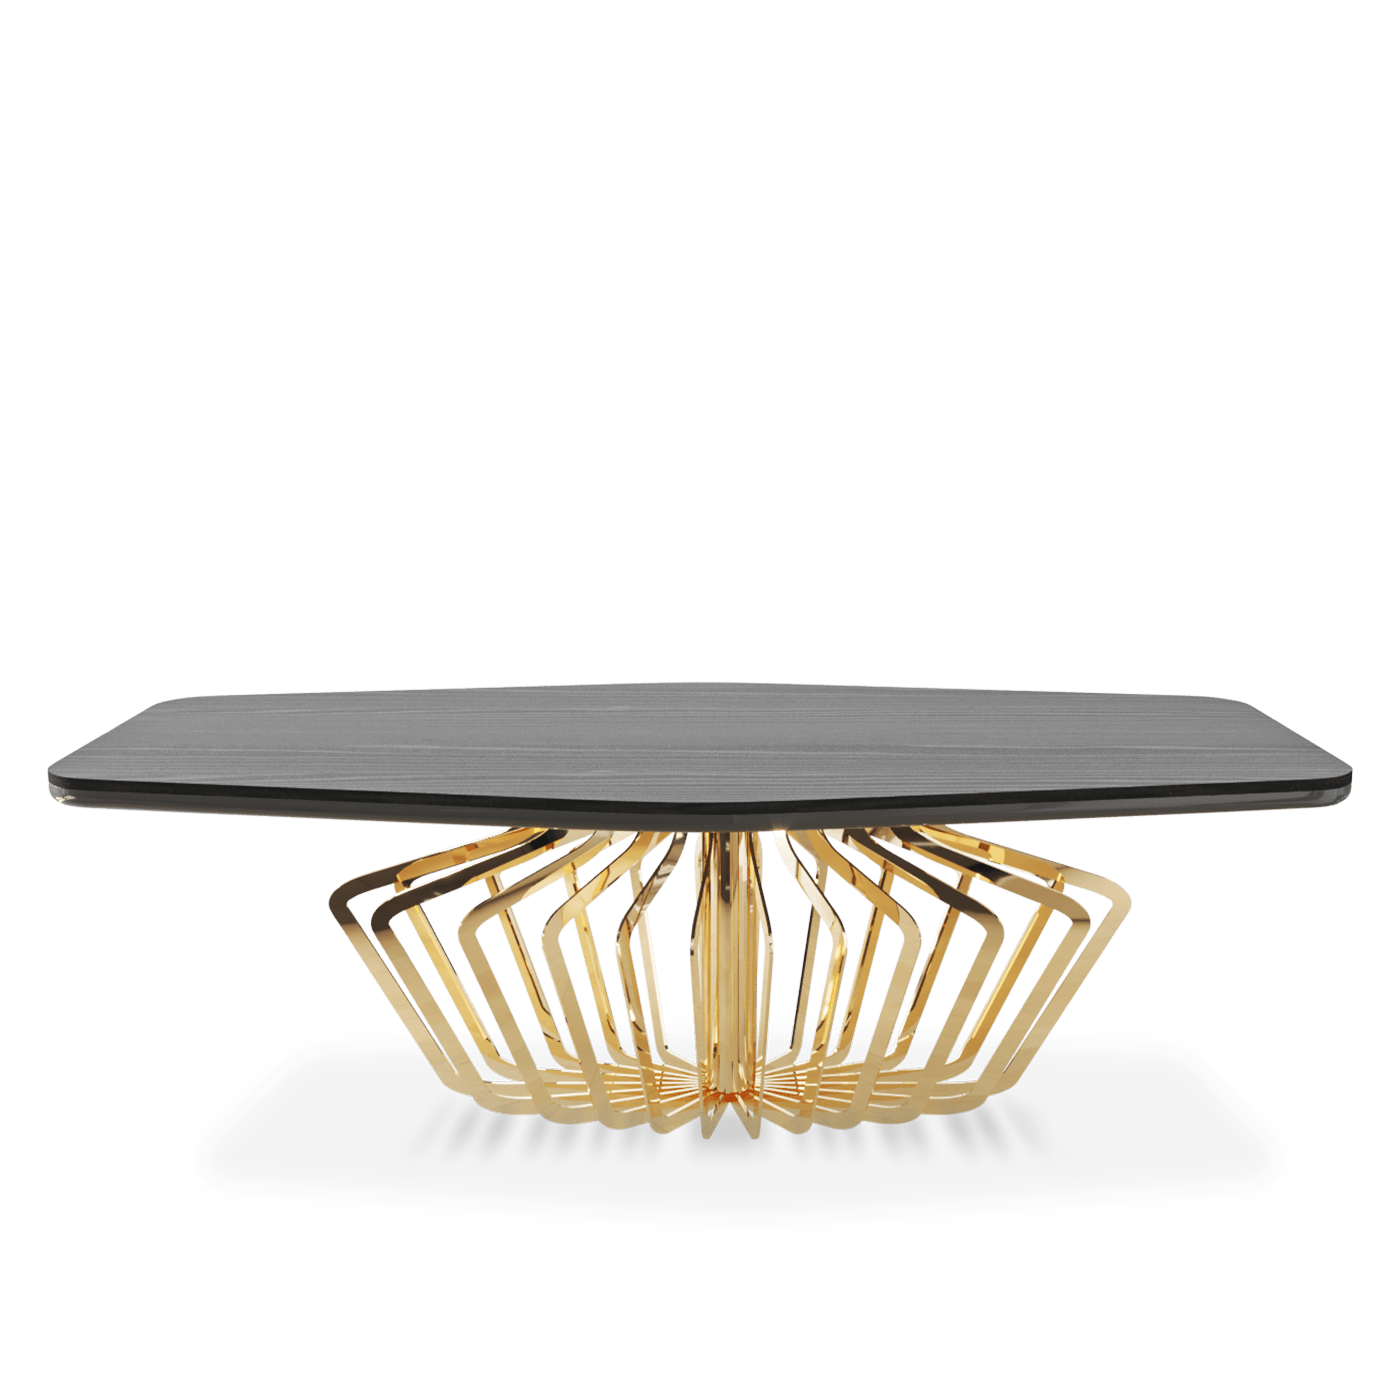 Zybra dining table